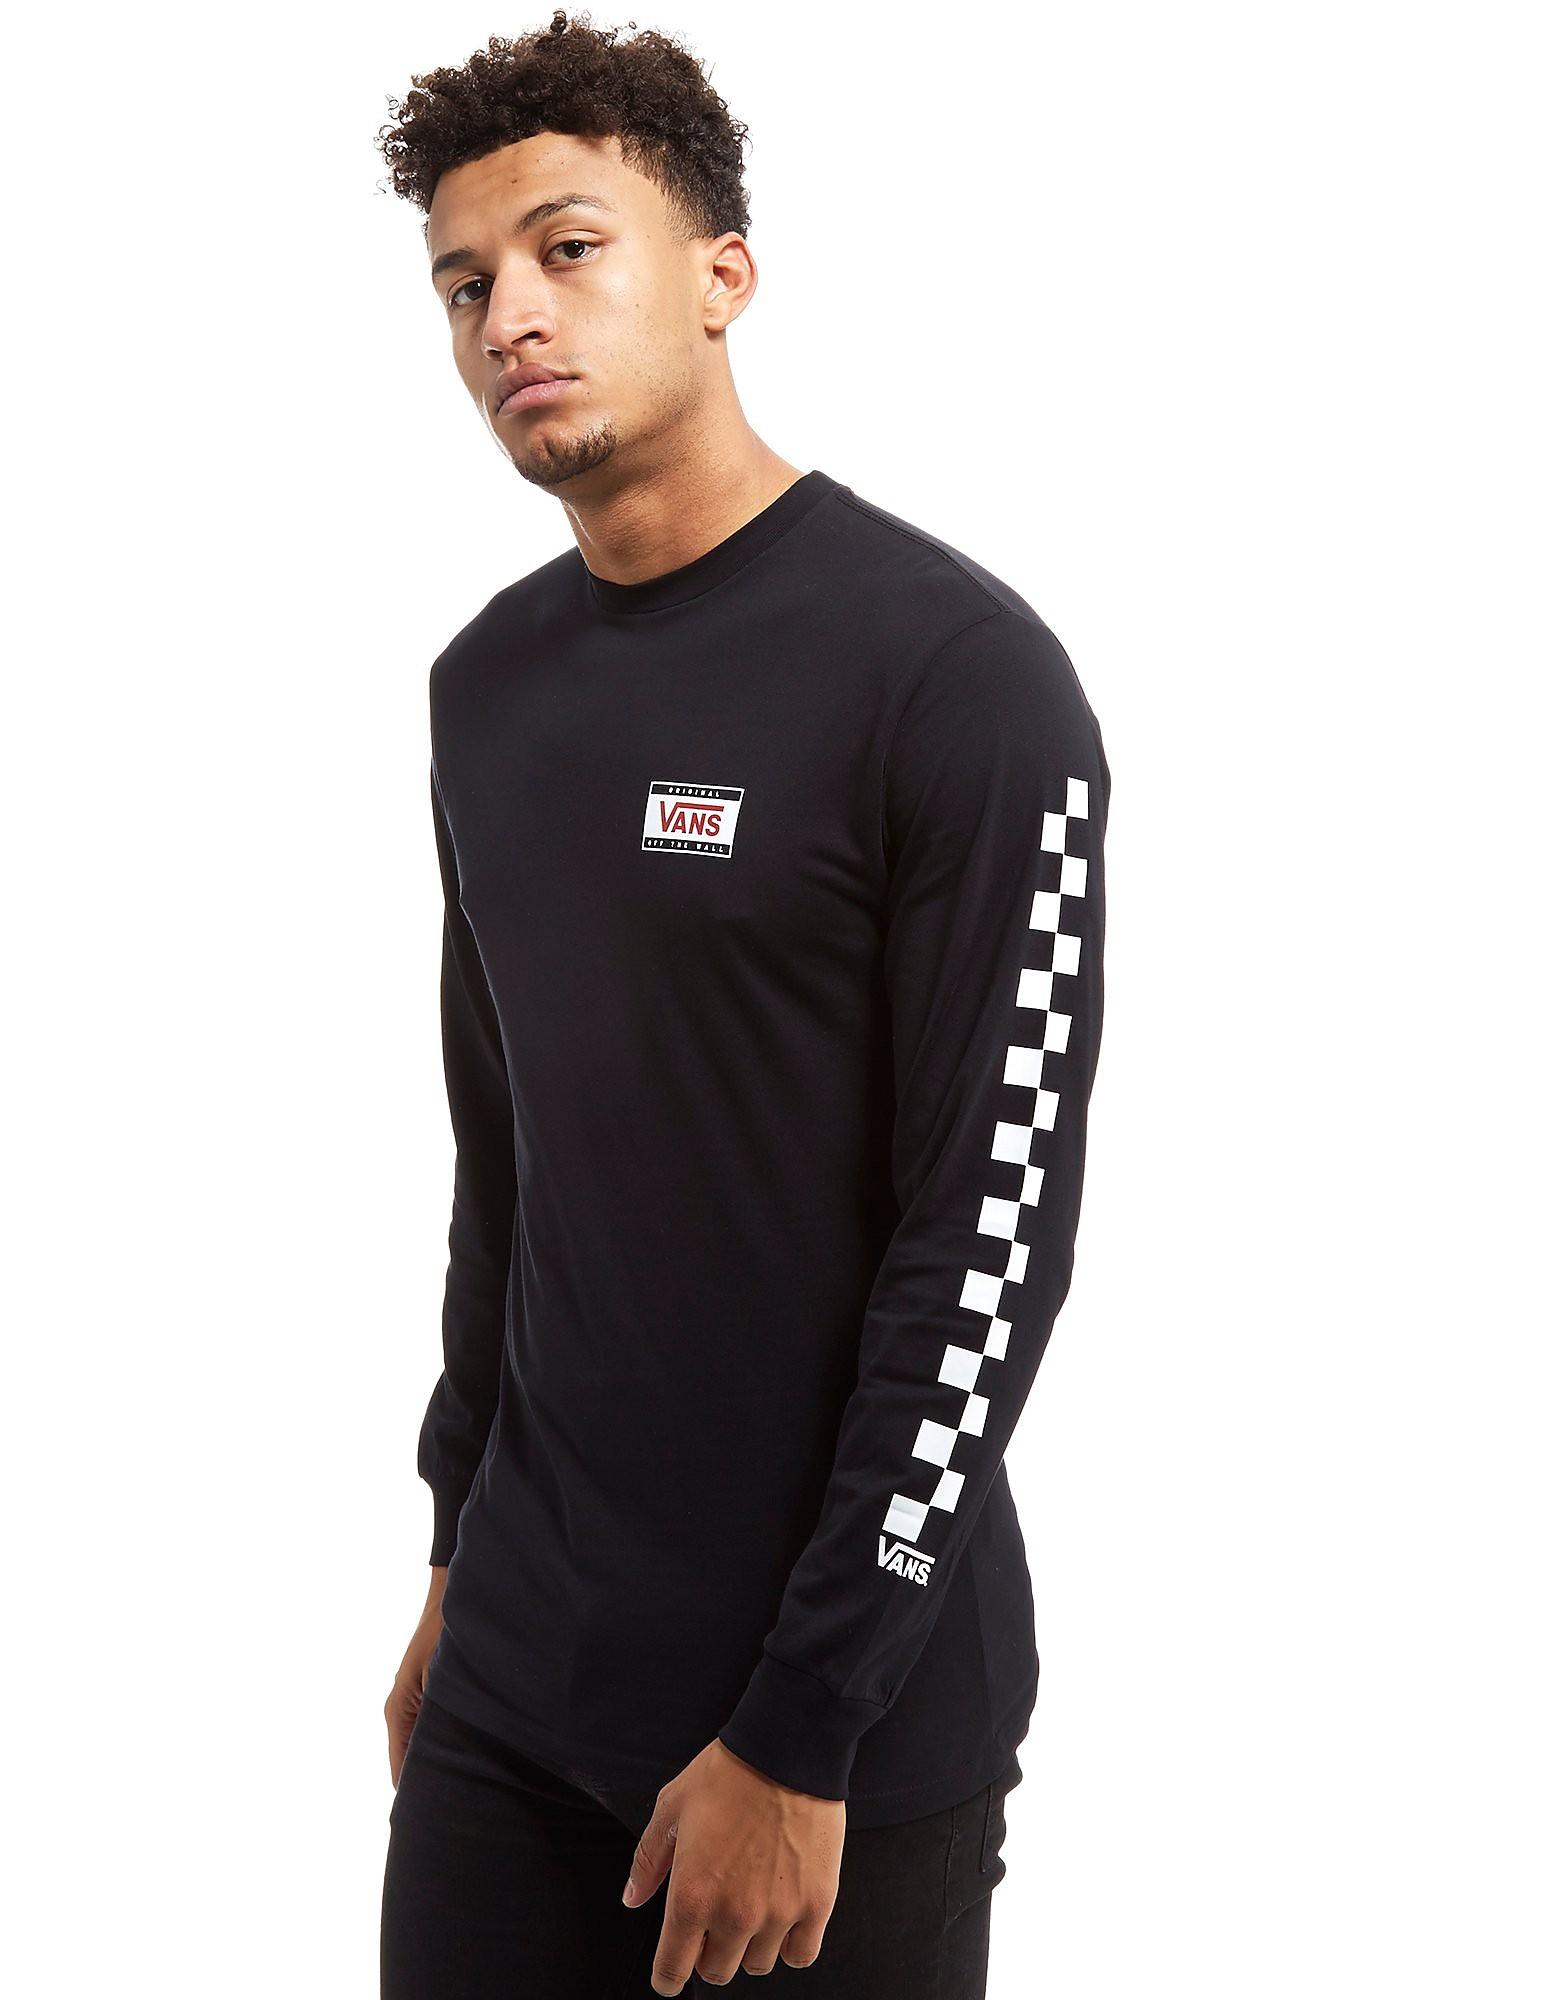 Vans Checkerboard Long Sleeve T-Shirt